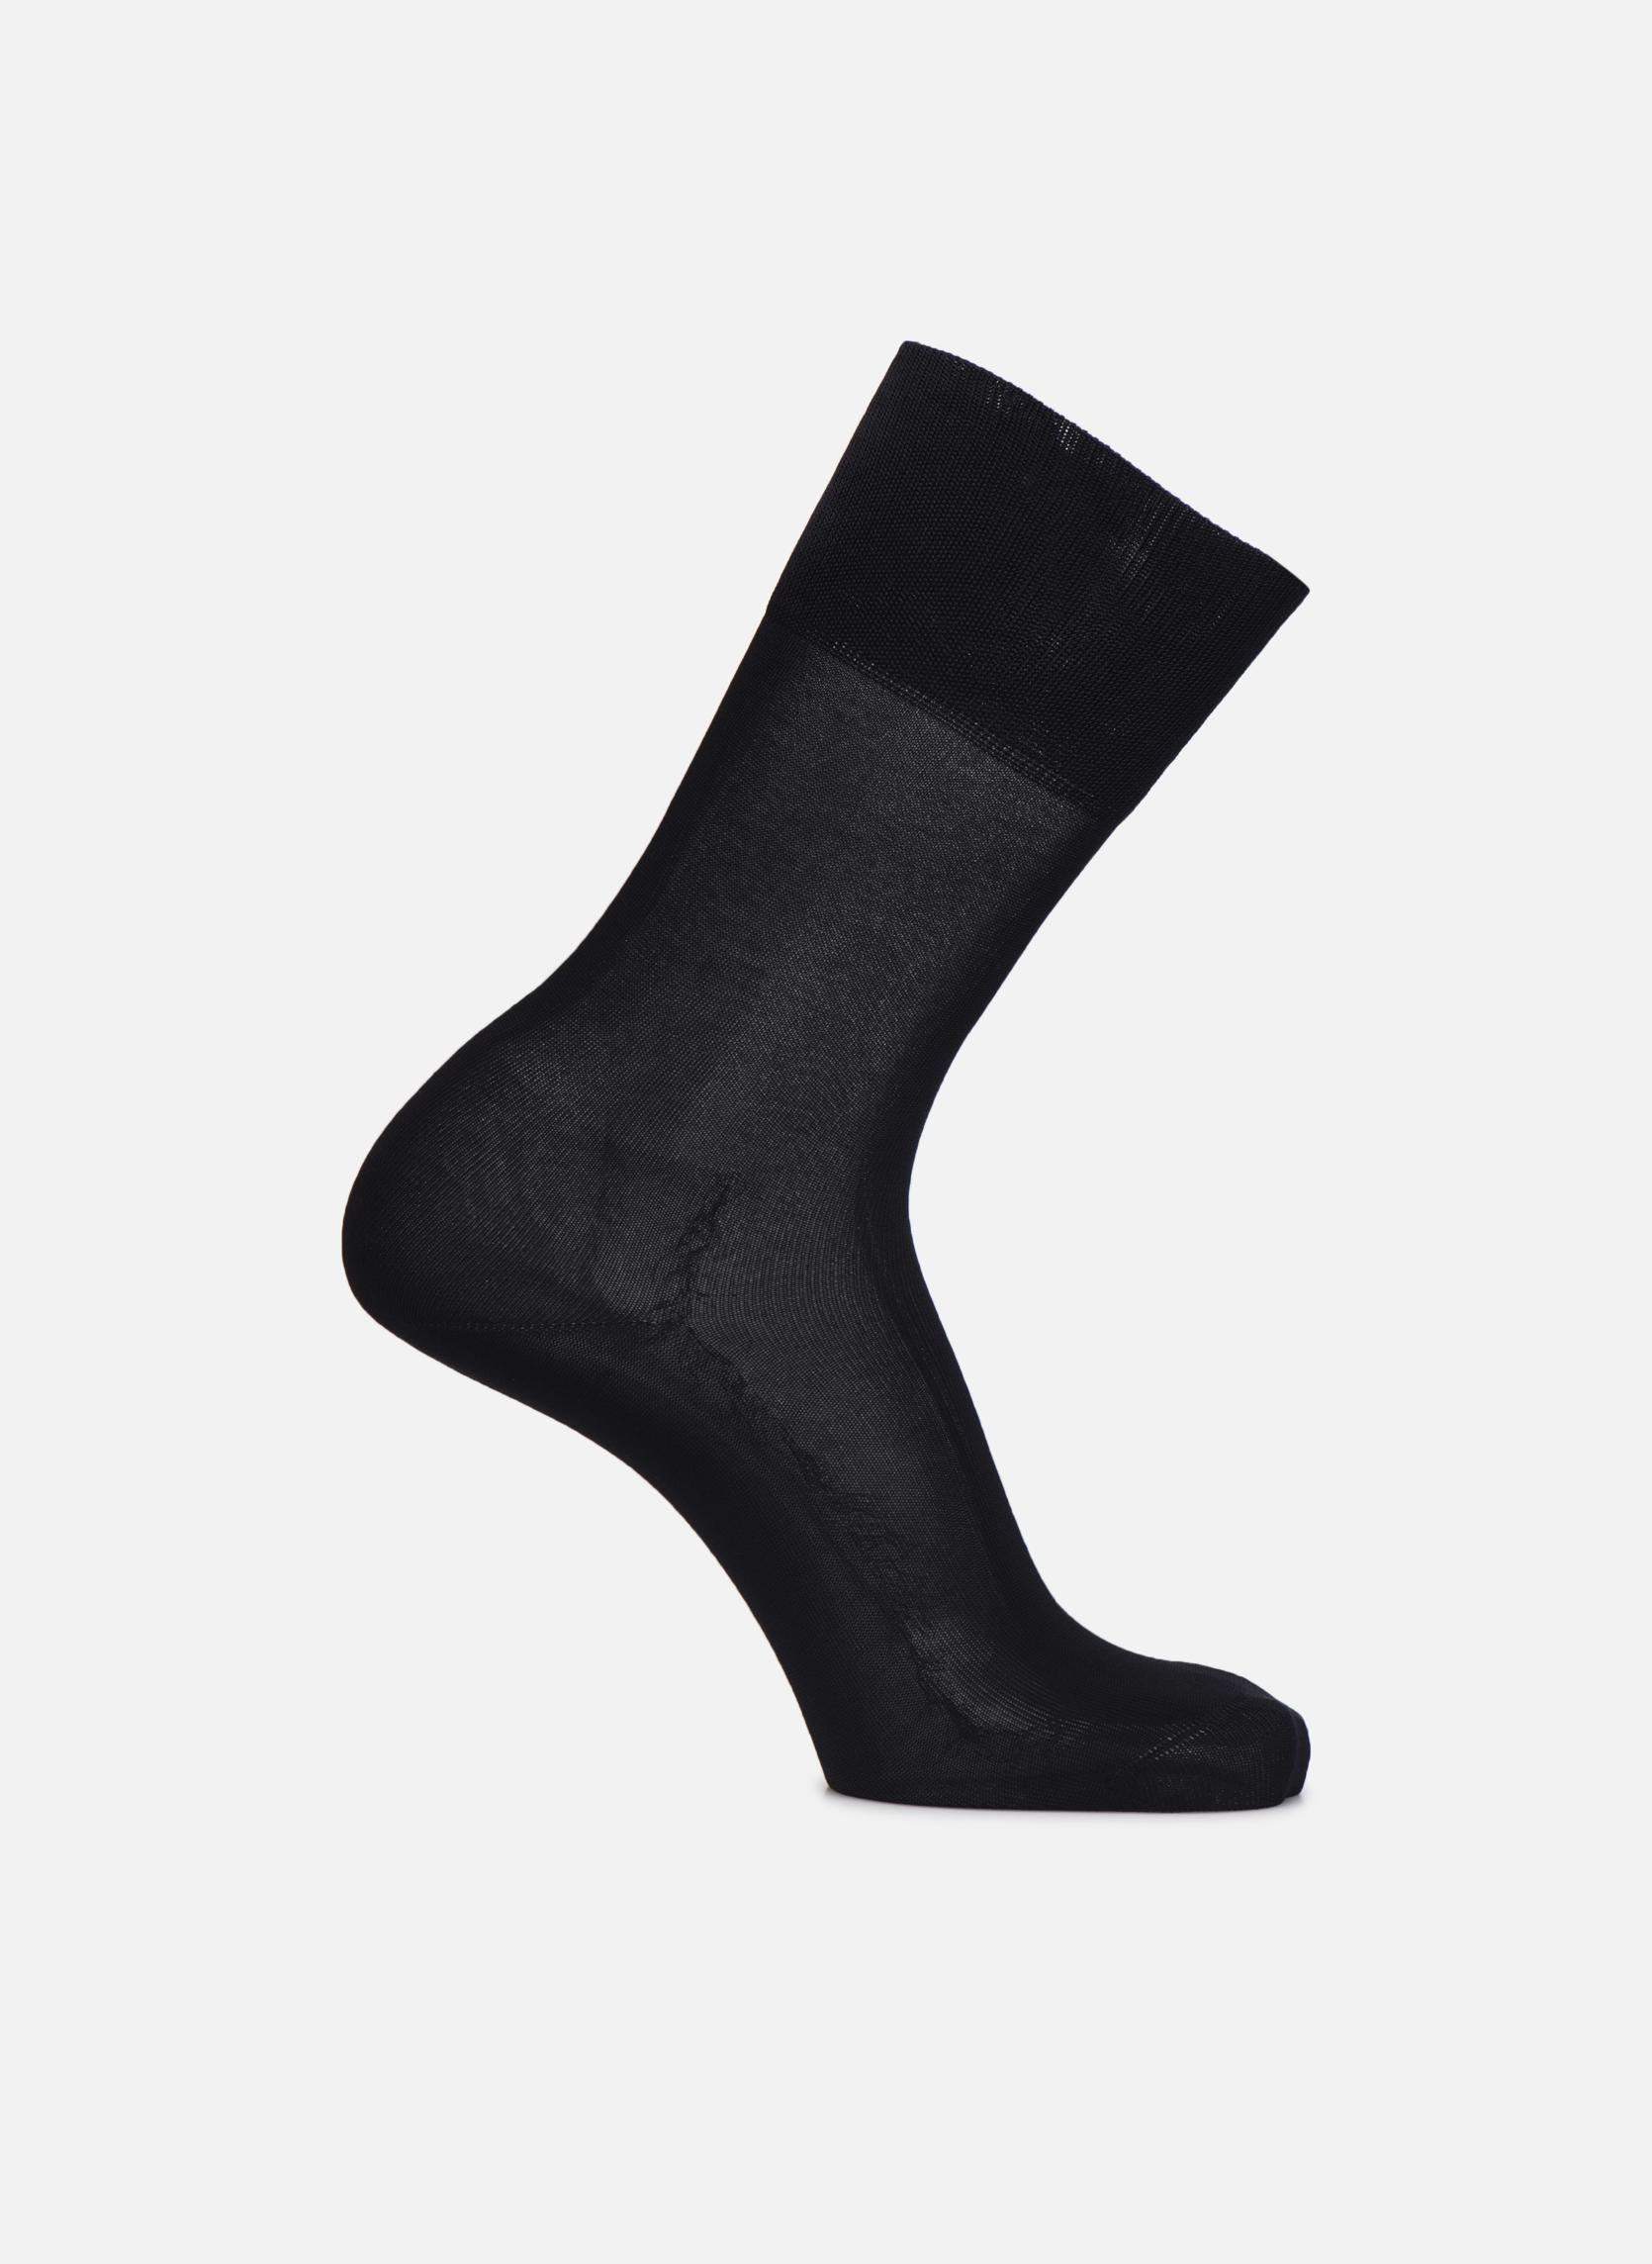 Socken & Strumpfhosen Accessoires Socken TIAGO